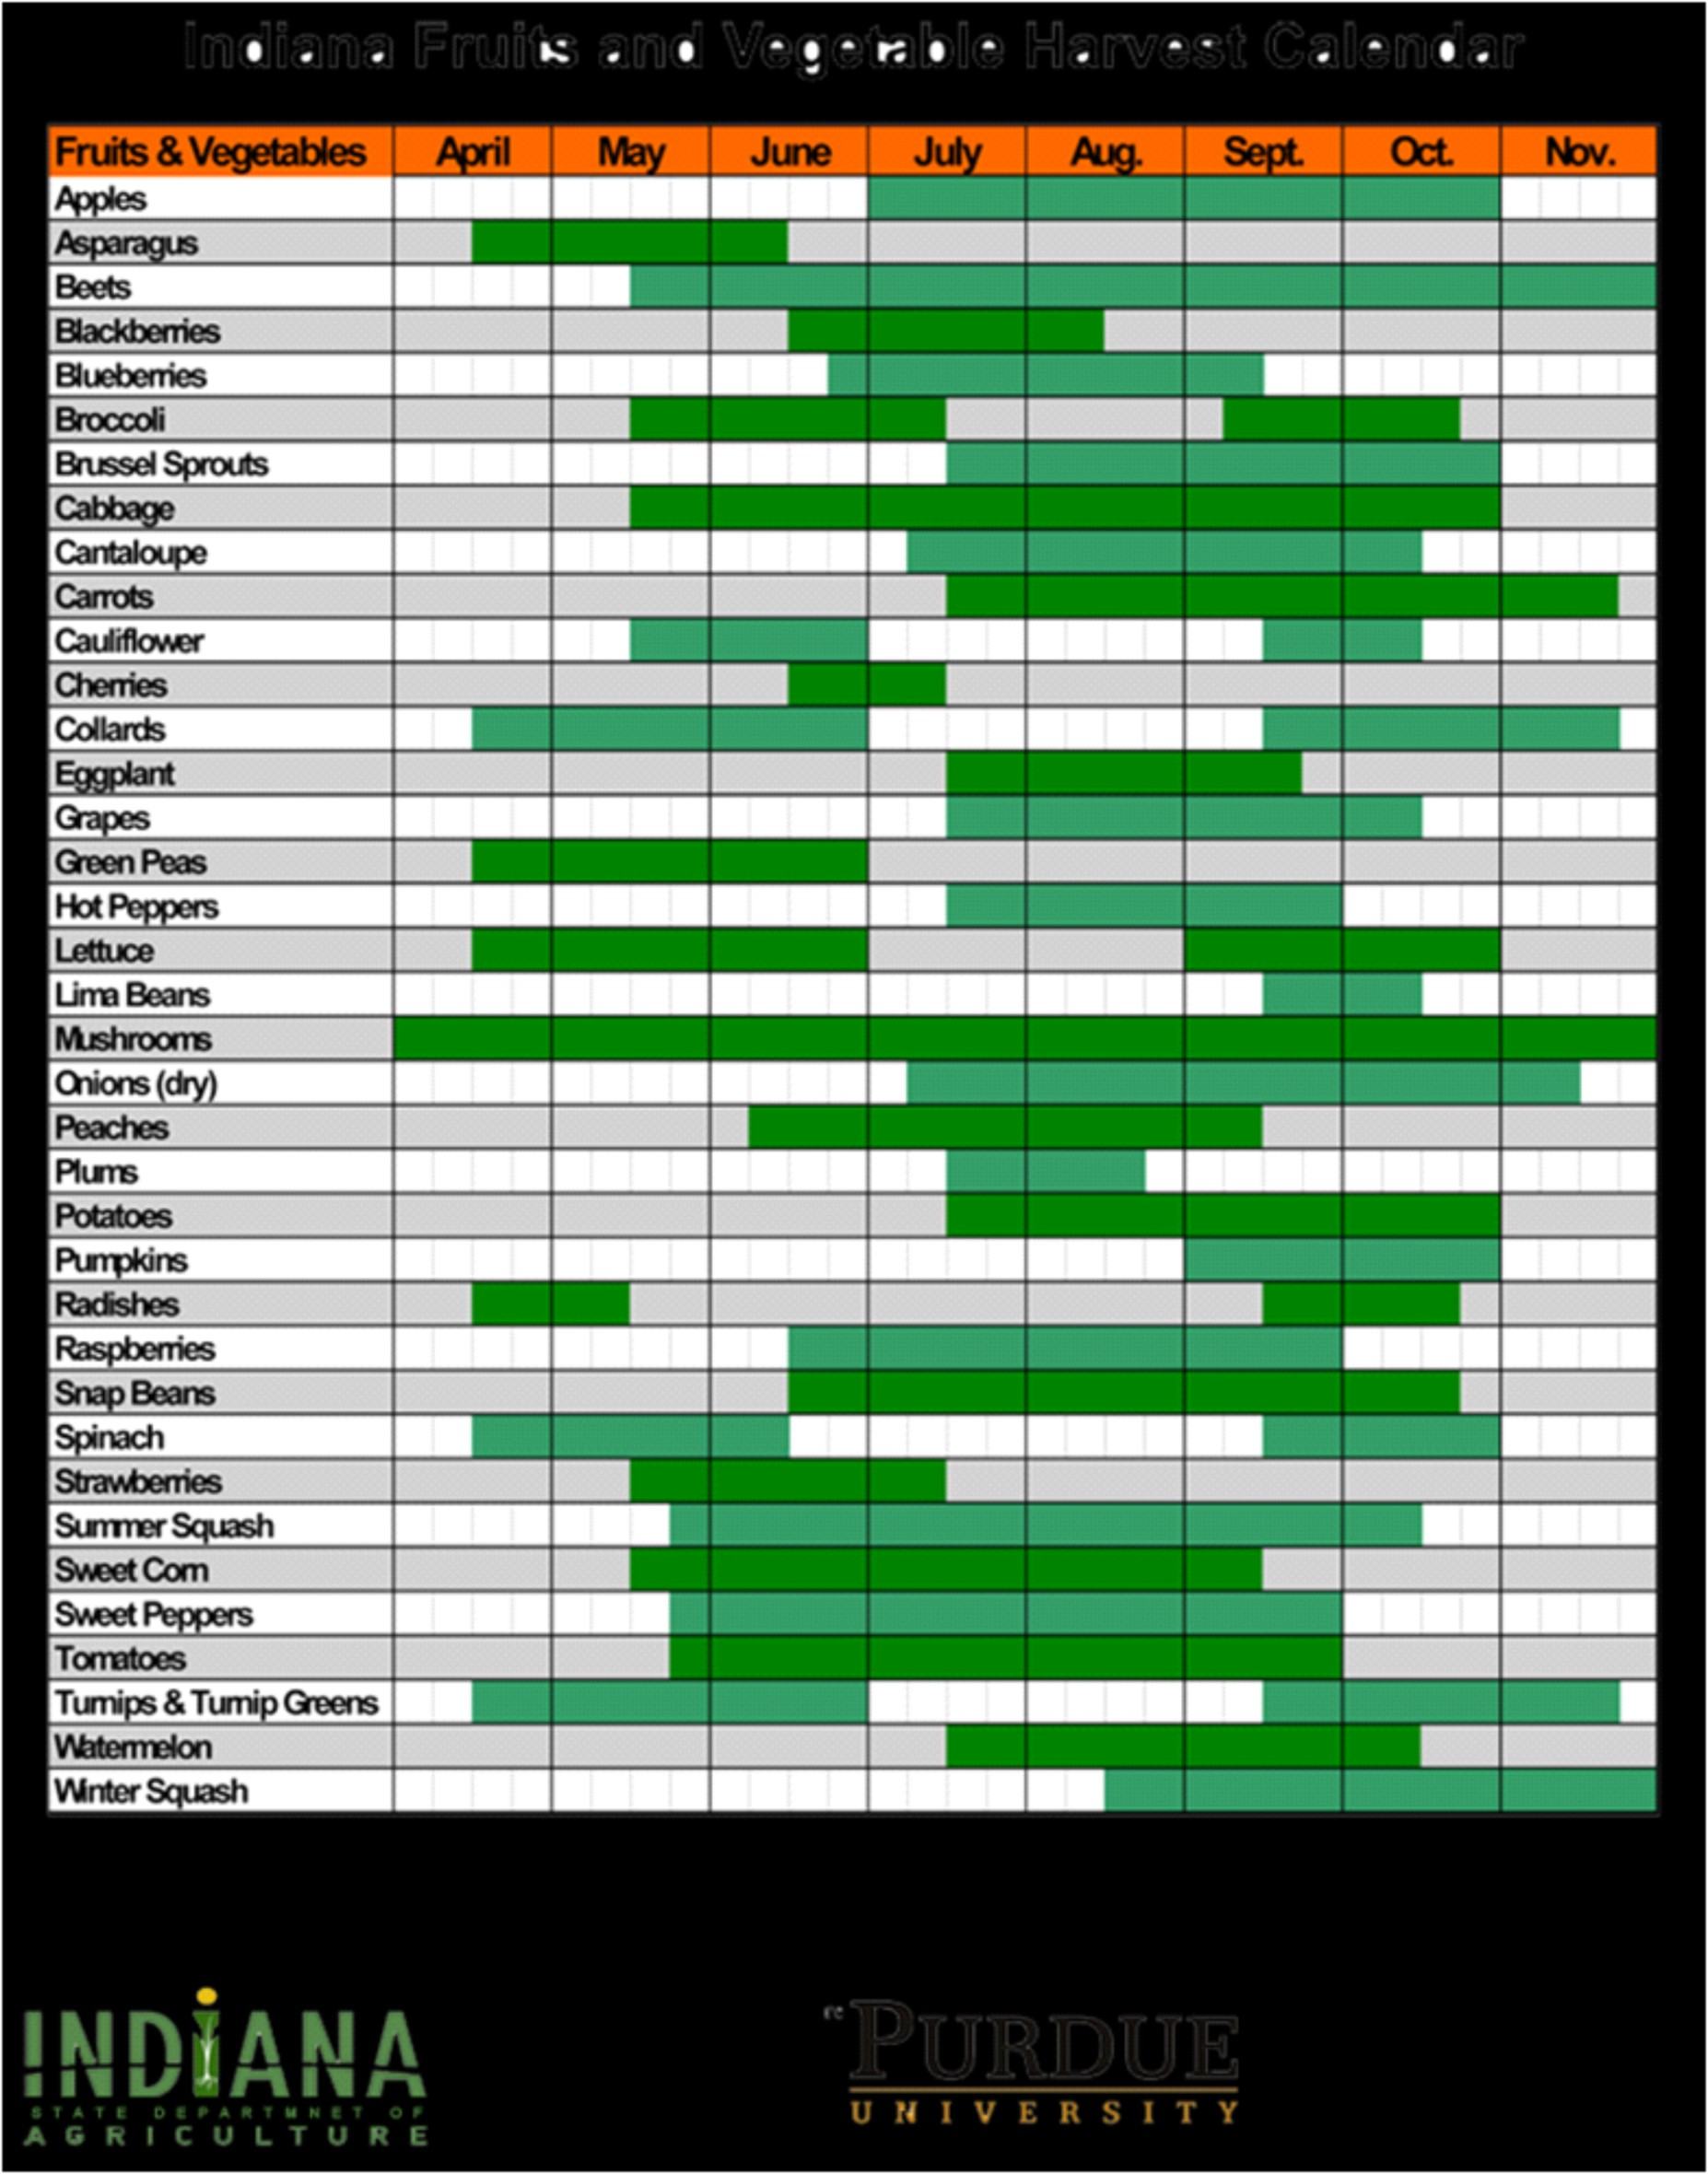 Seasonal Chart June issue